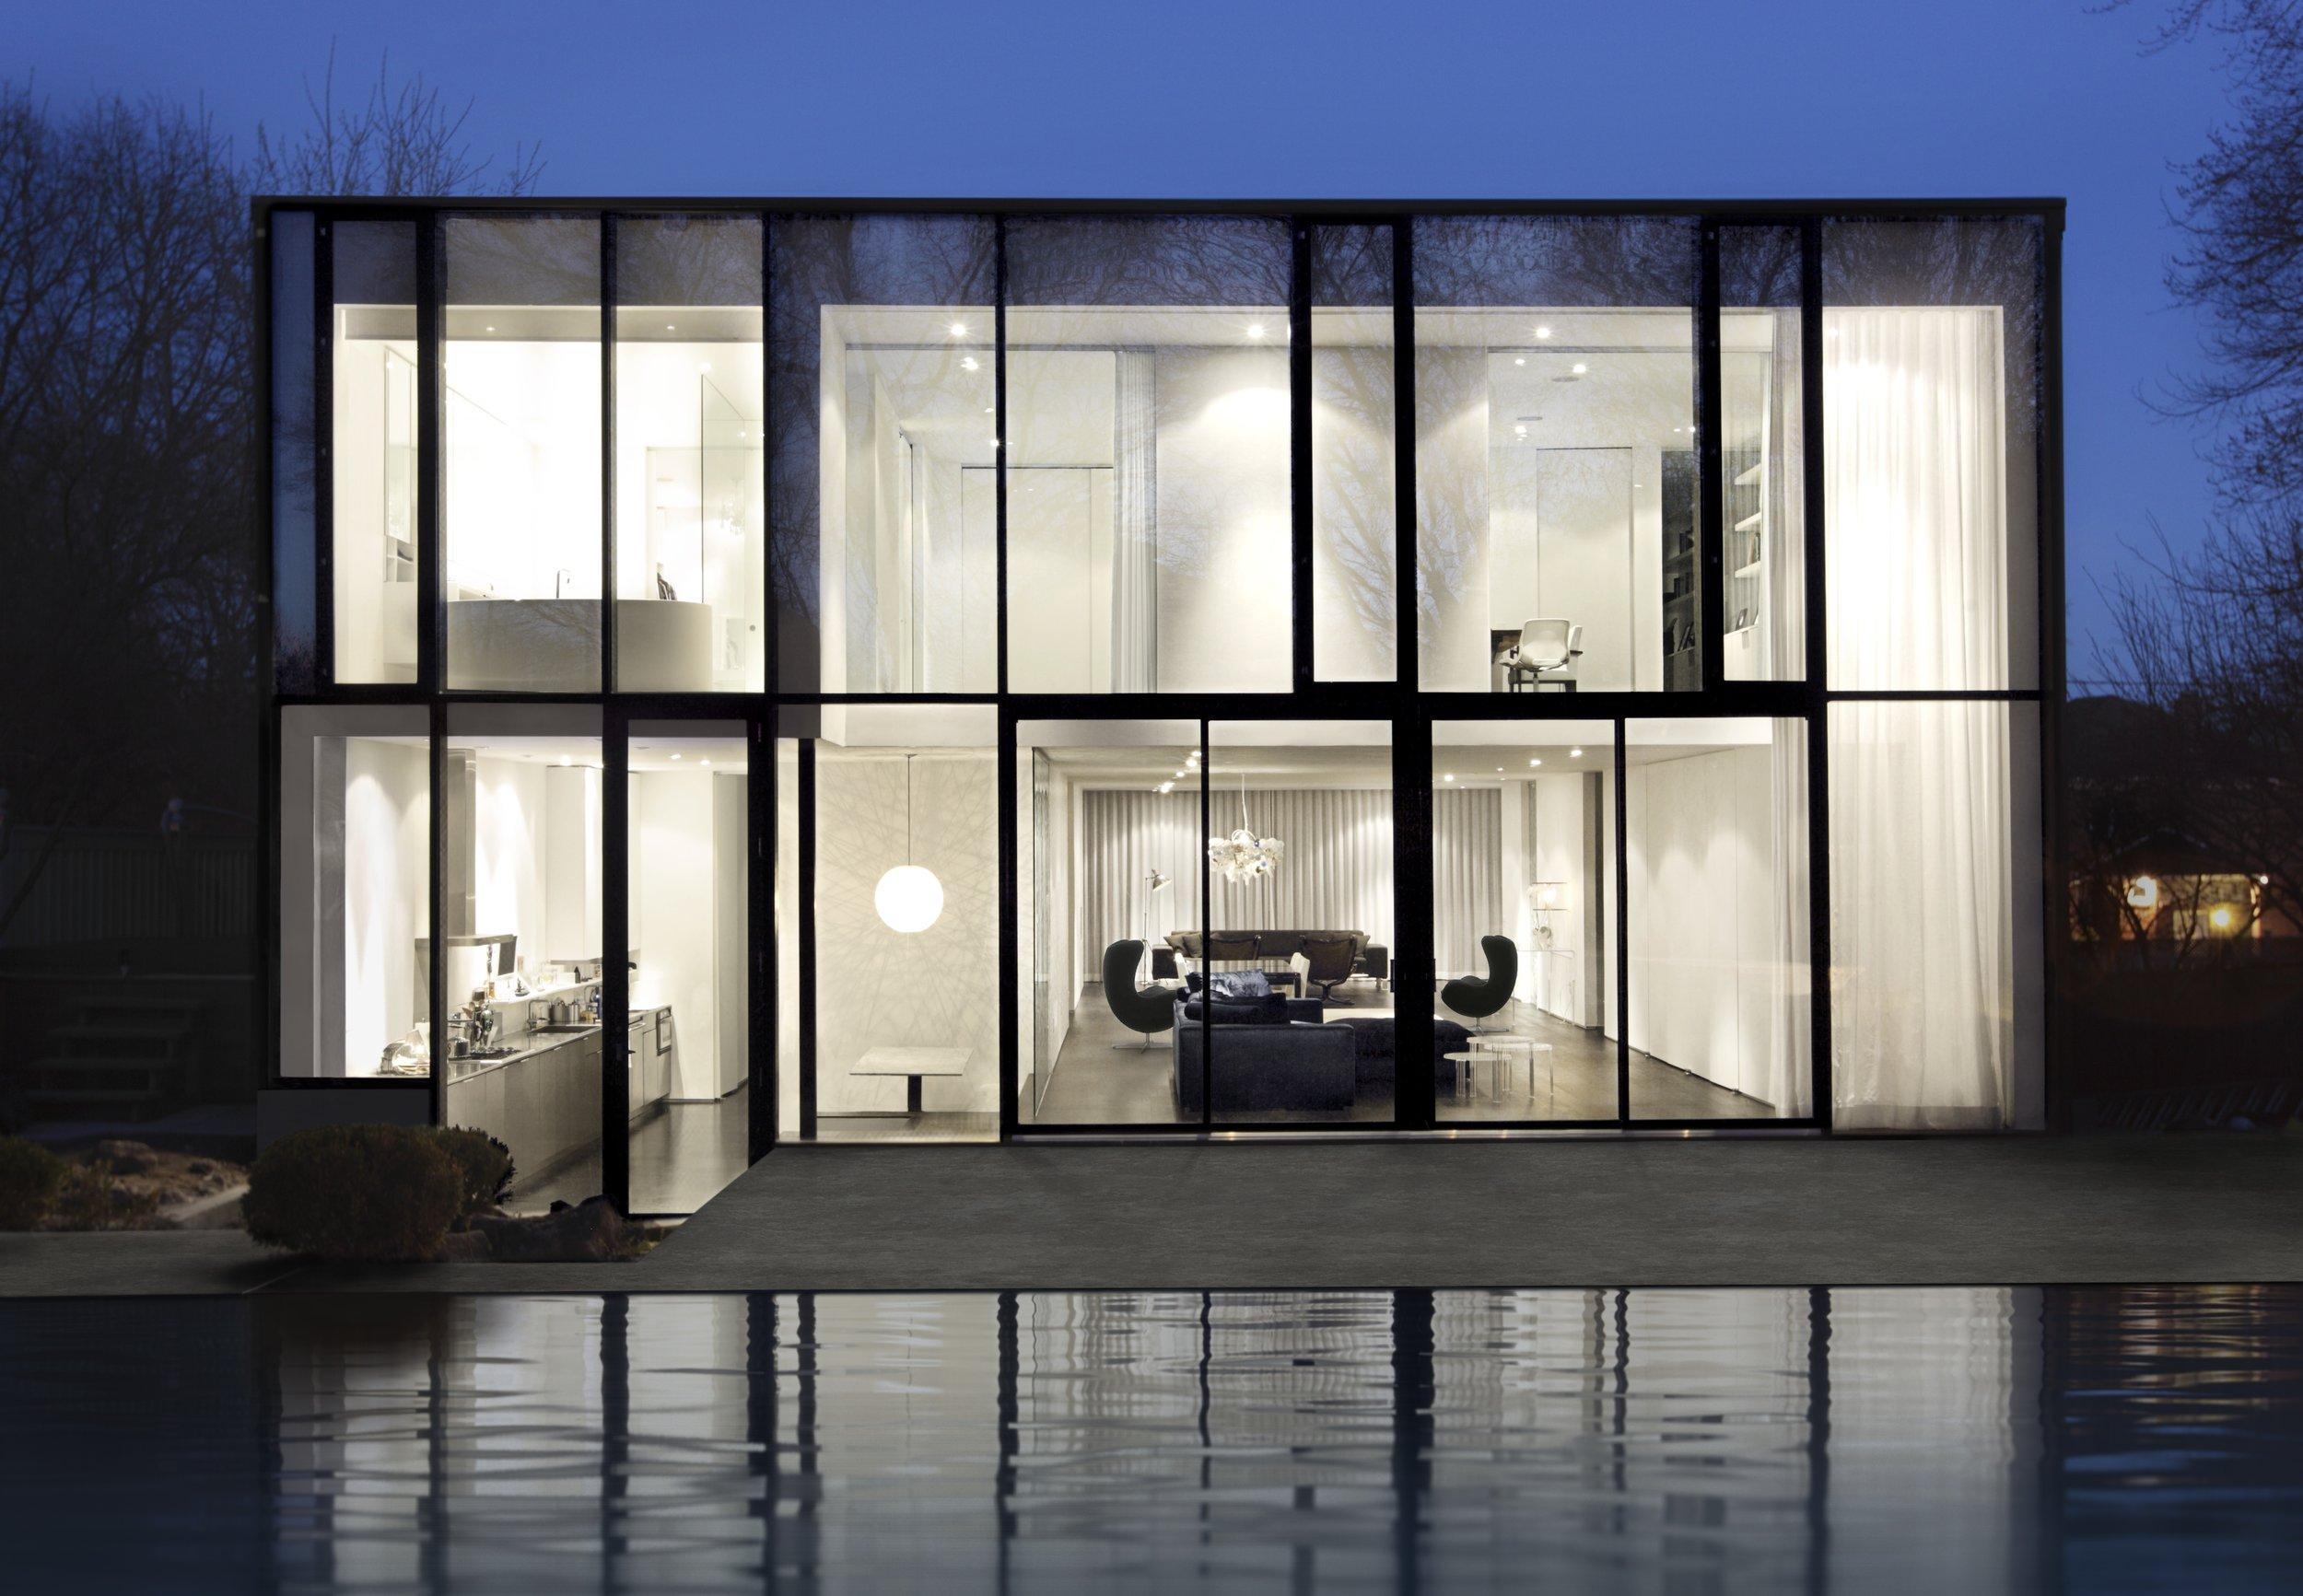 House 60 - back wall two storey window wall pool backyard elevat